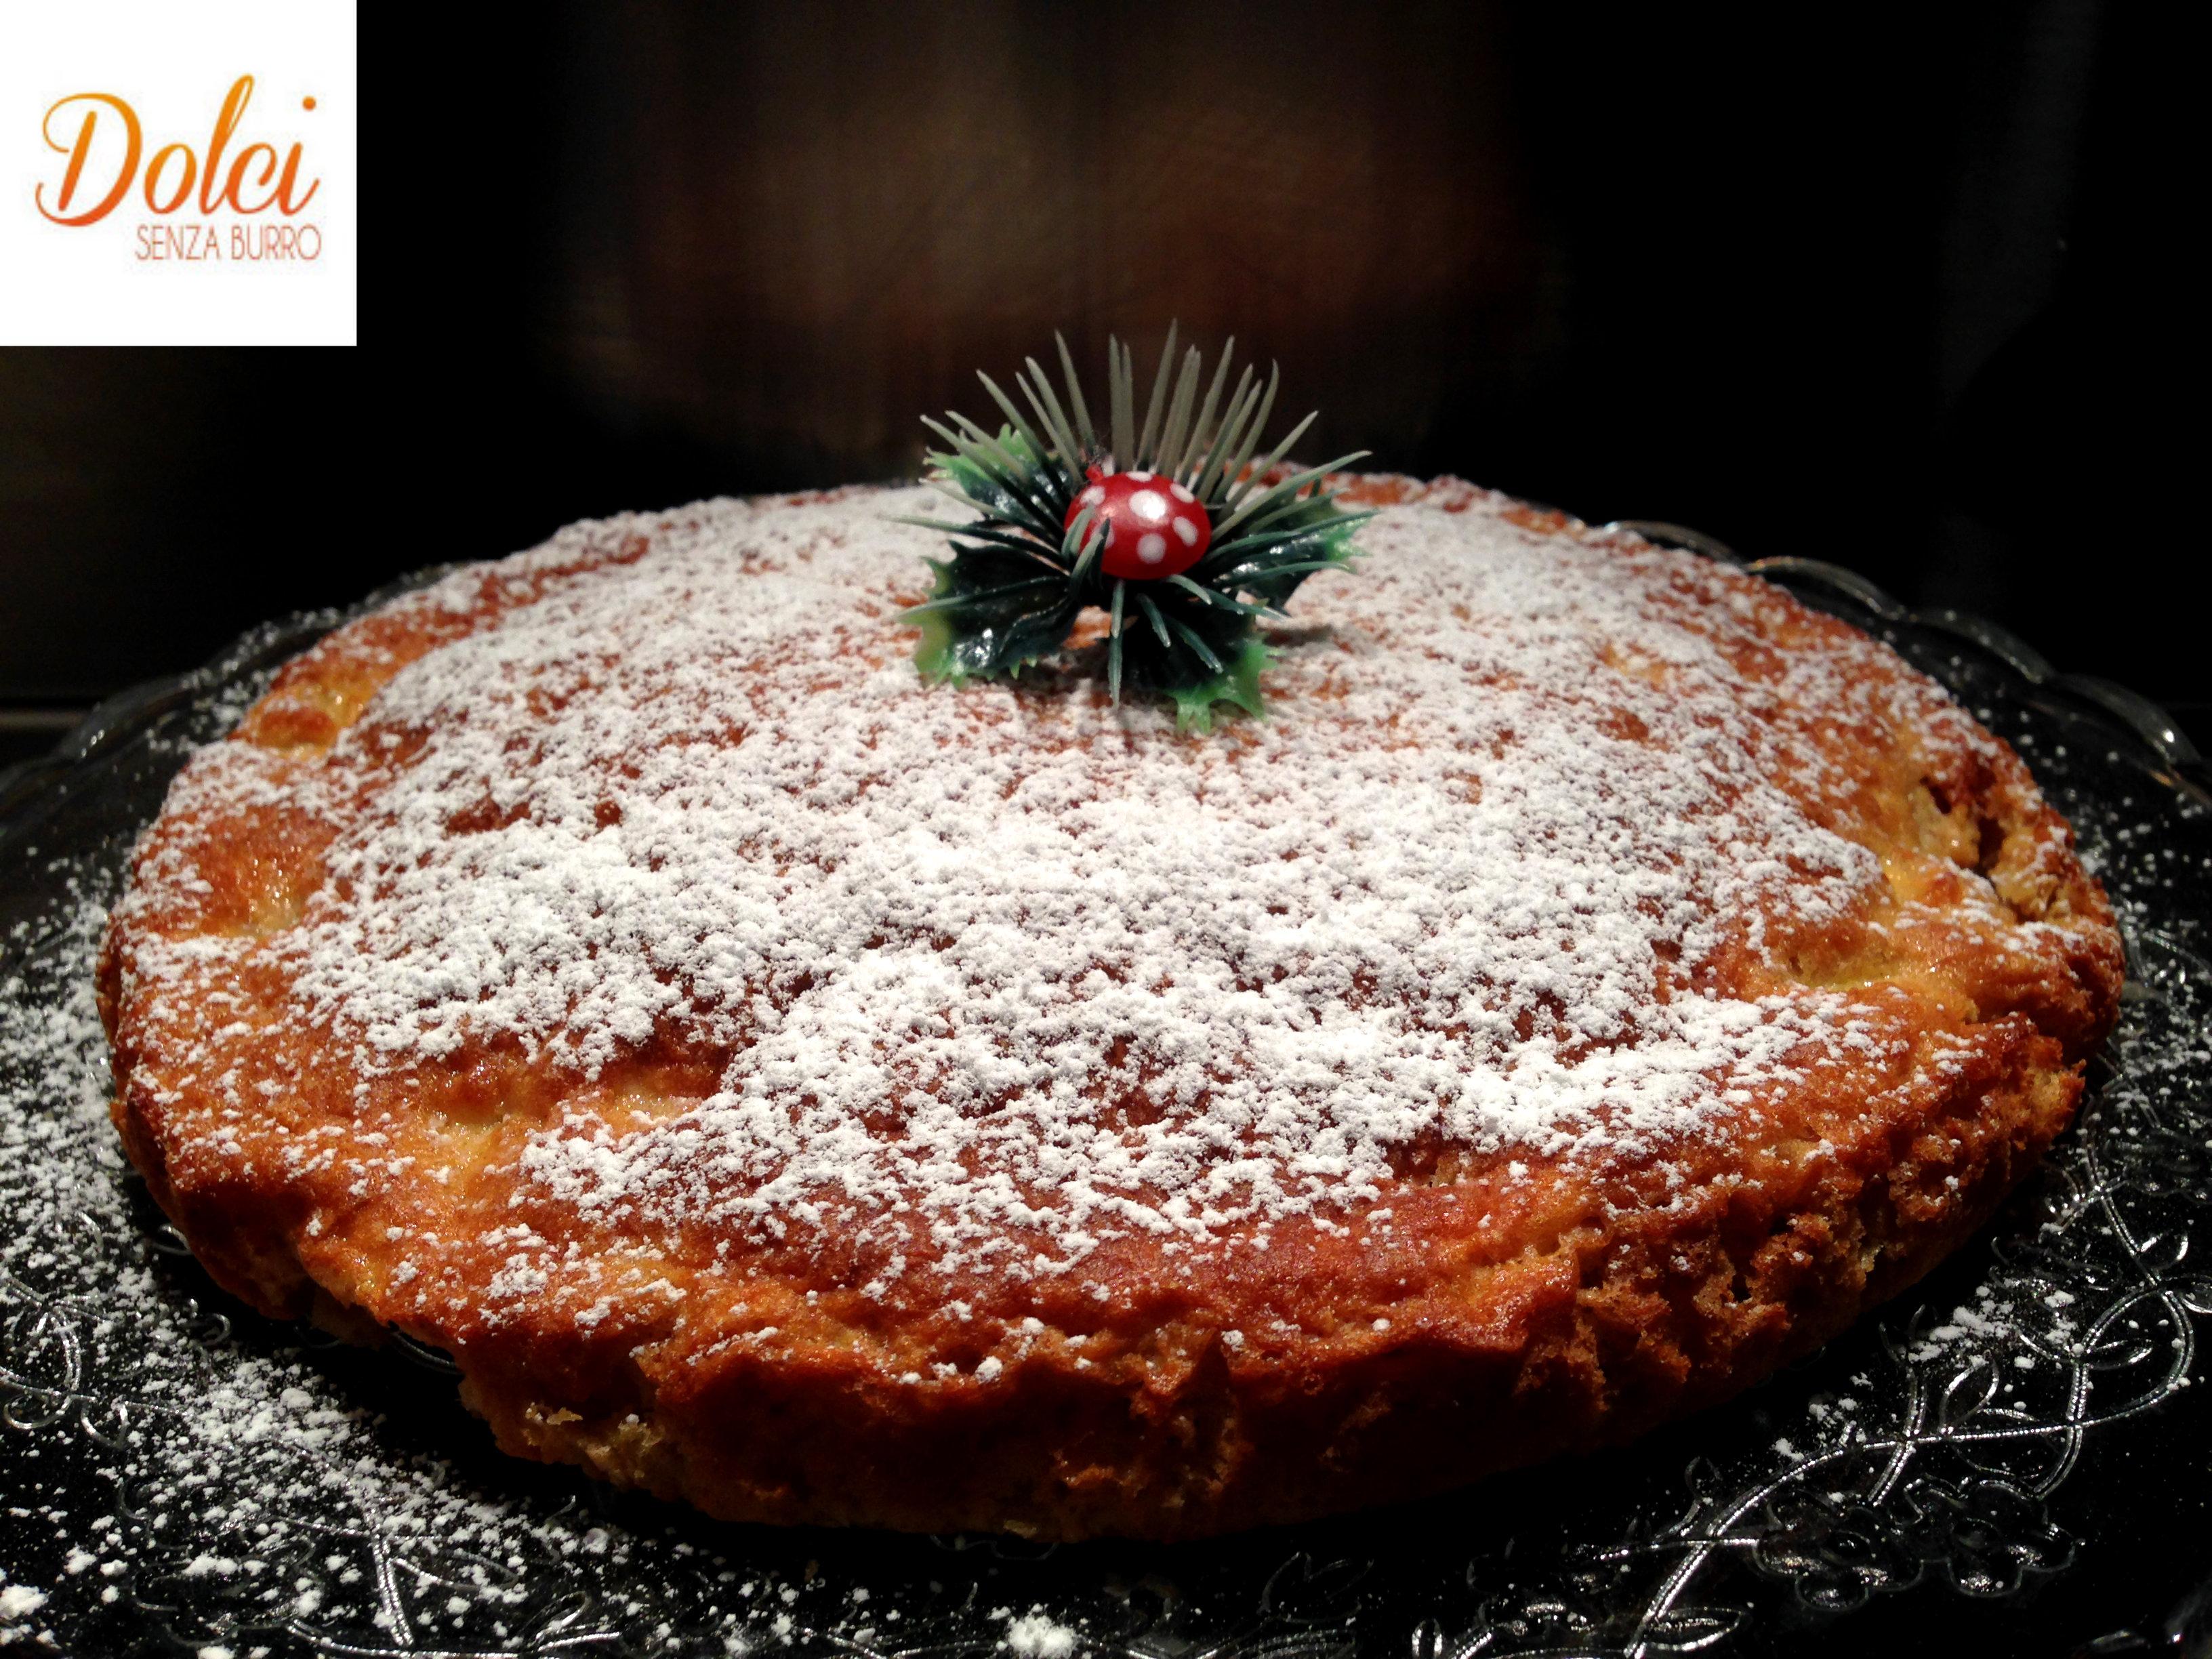 Torta di Mele Senza Burro Grattugiate , il dolce di mele di Dolci Senza Burro